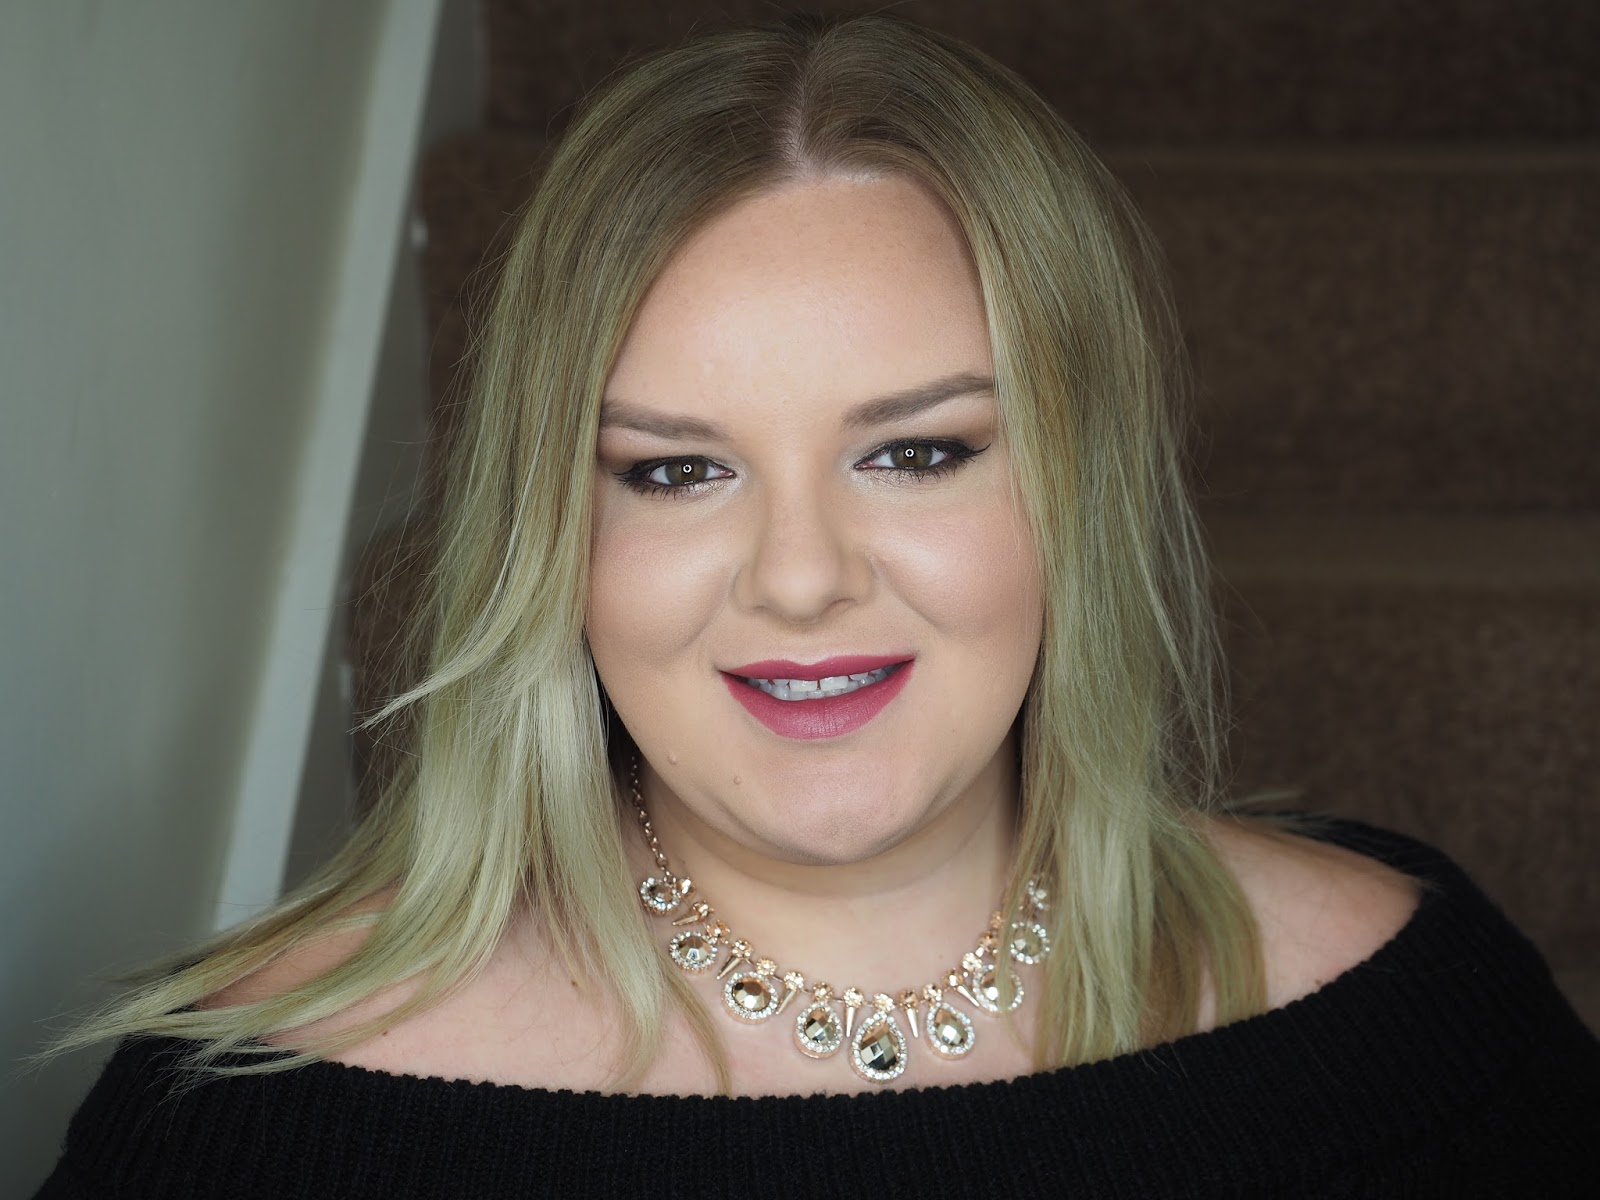 Rimmel #GetReadyWithRimmel Makeup Look using Rimmel Scandaleyes Reloaded Mascara in Black and Extreme Black and Eyeliner Image